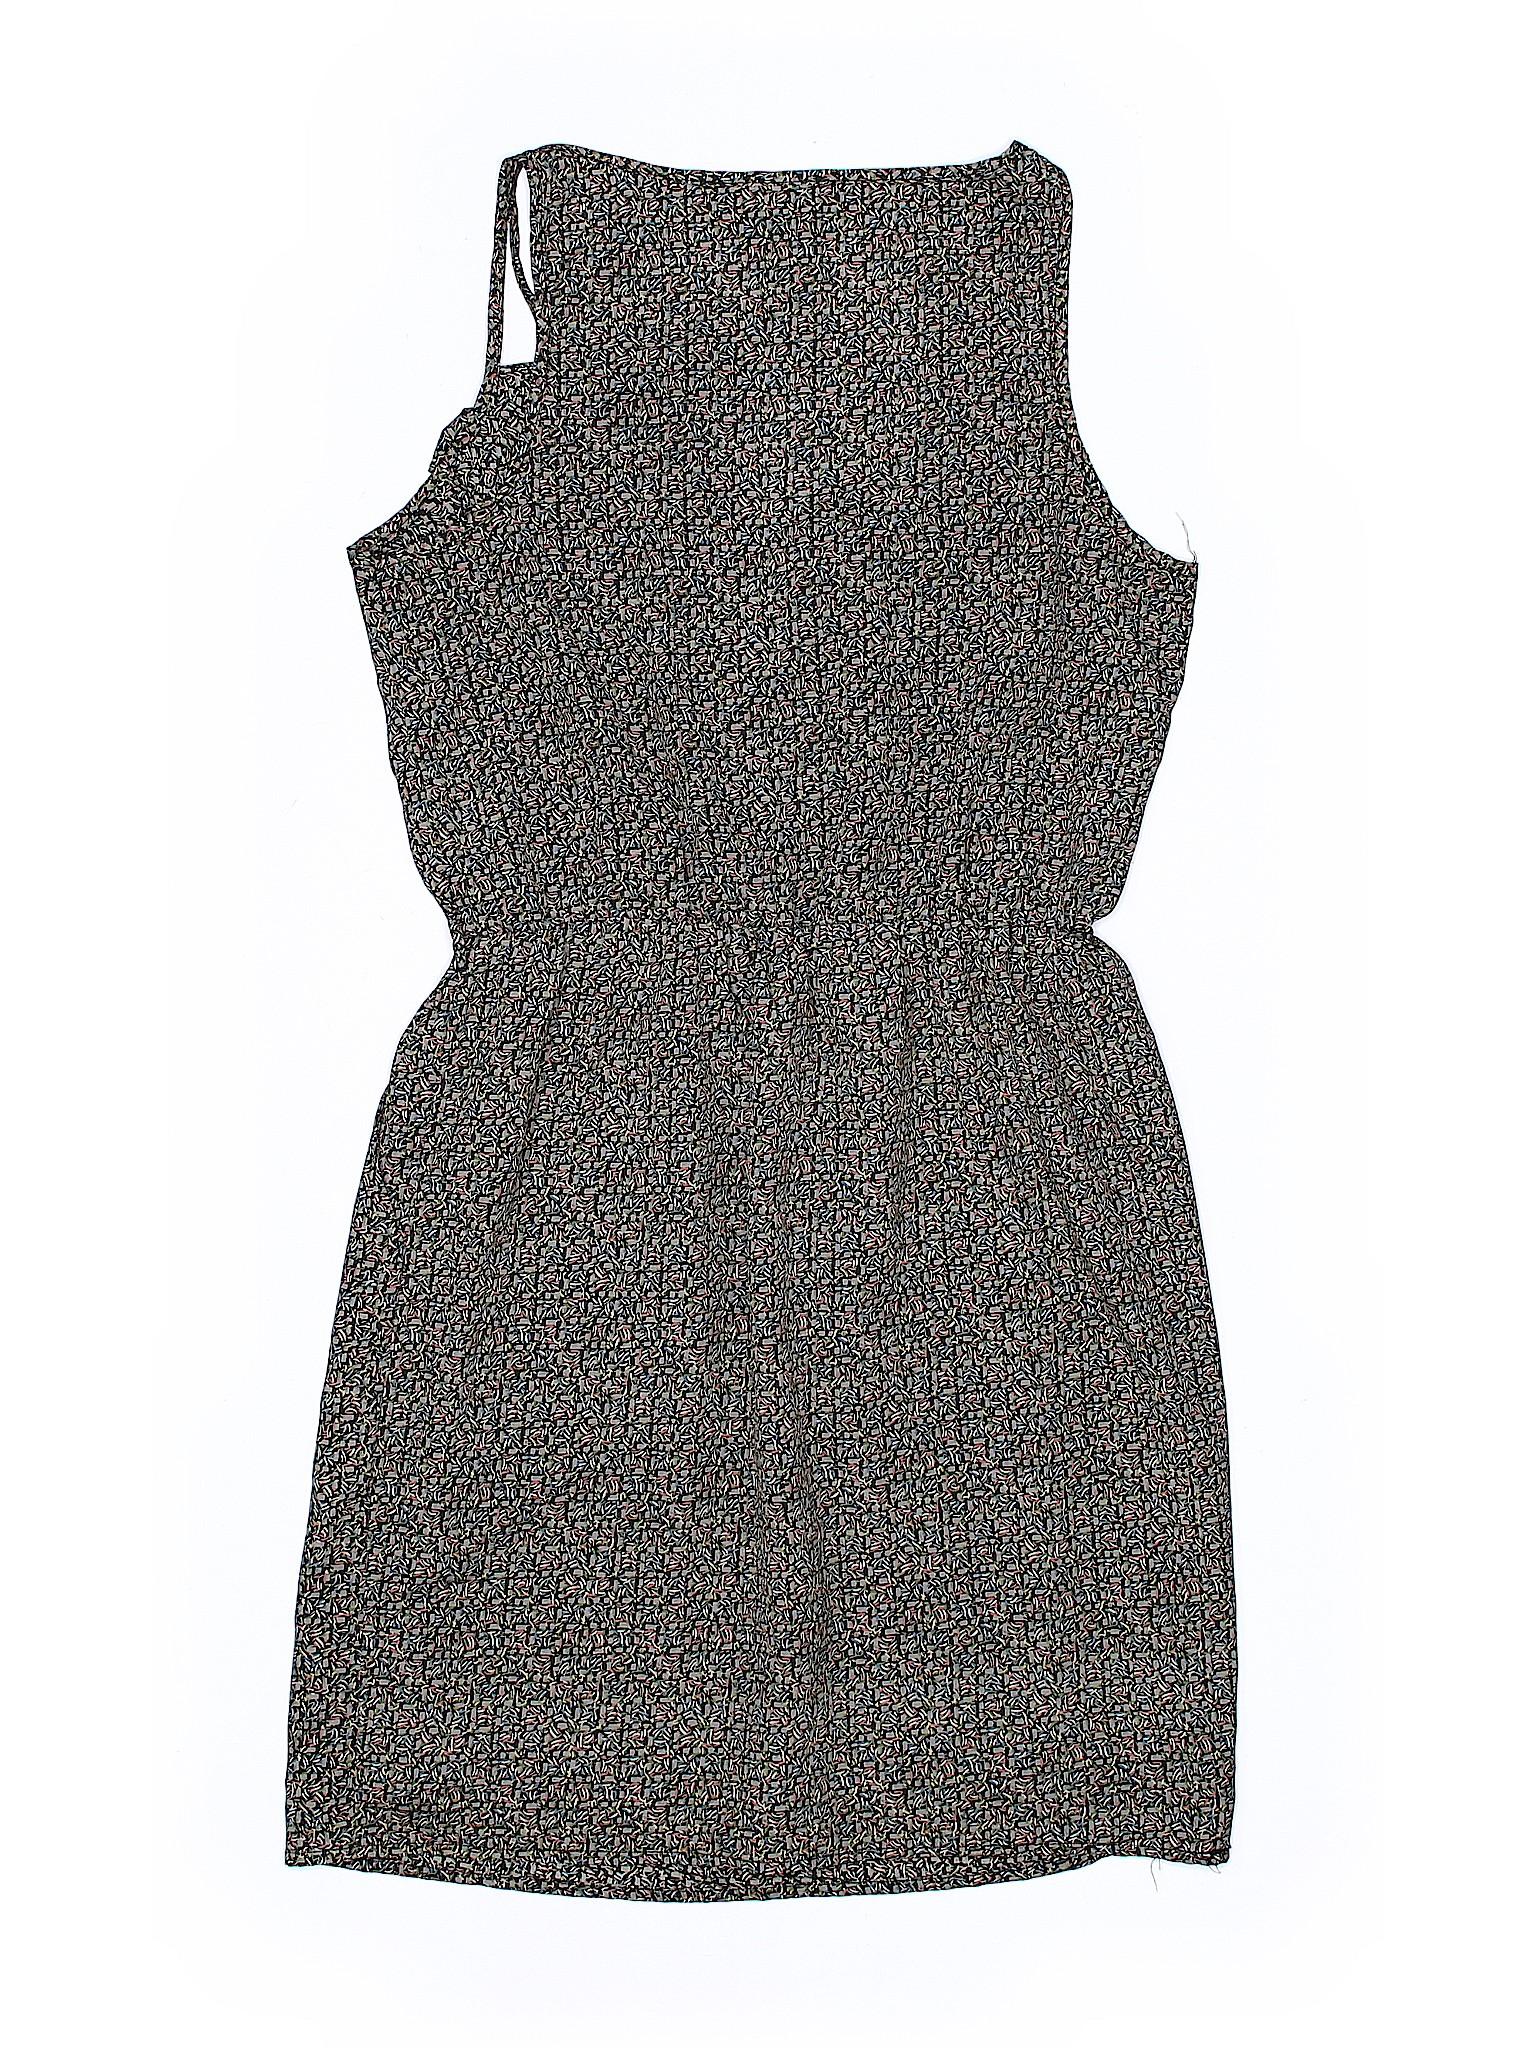 Boutique Casual Love Dress winter 21 rwHC6qr7x